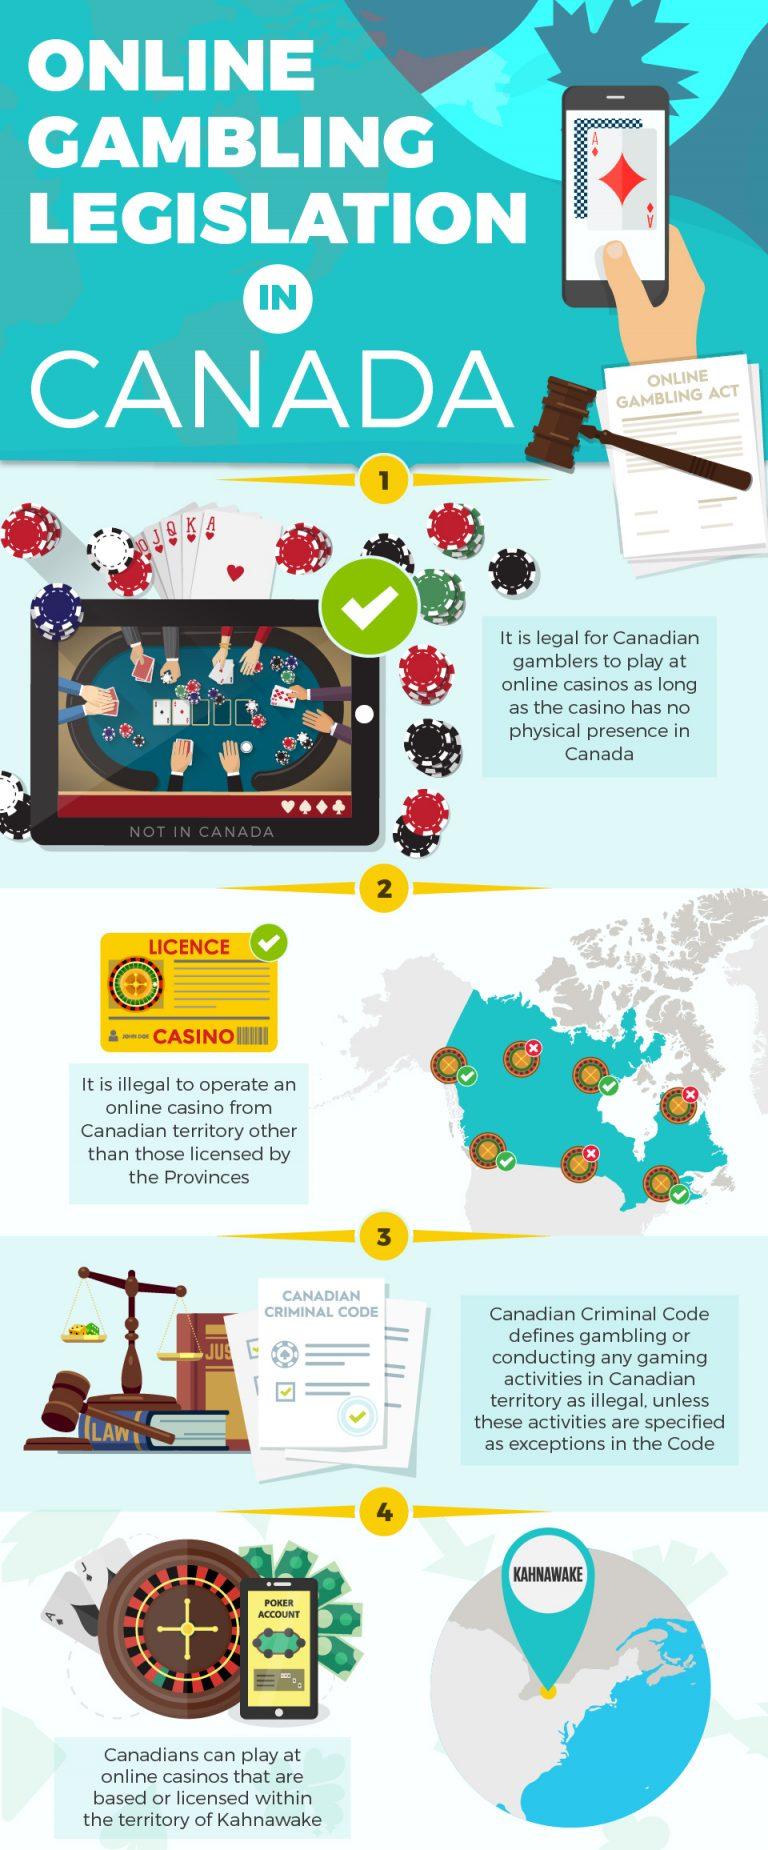 online gambling legislation in canada